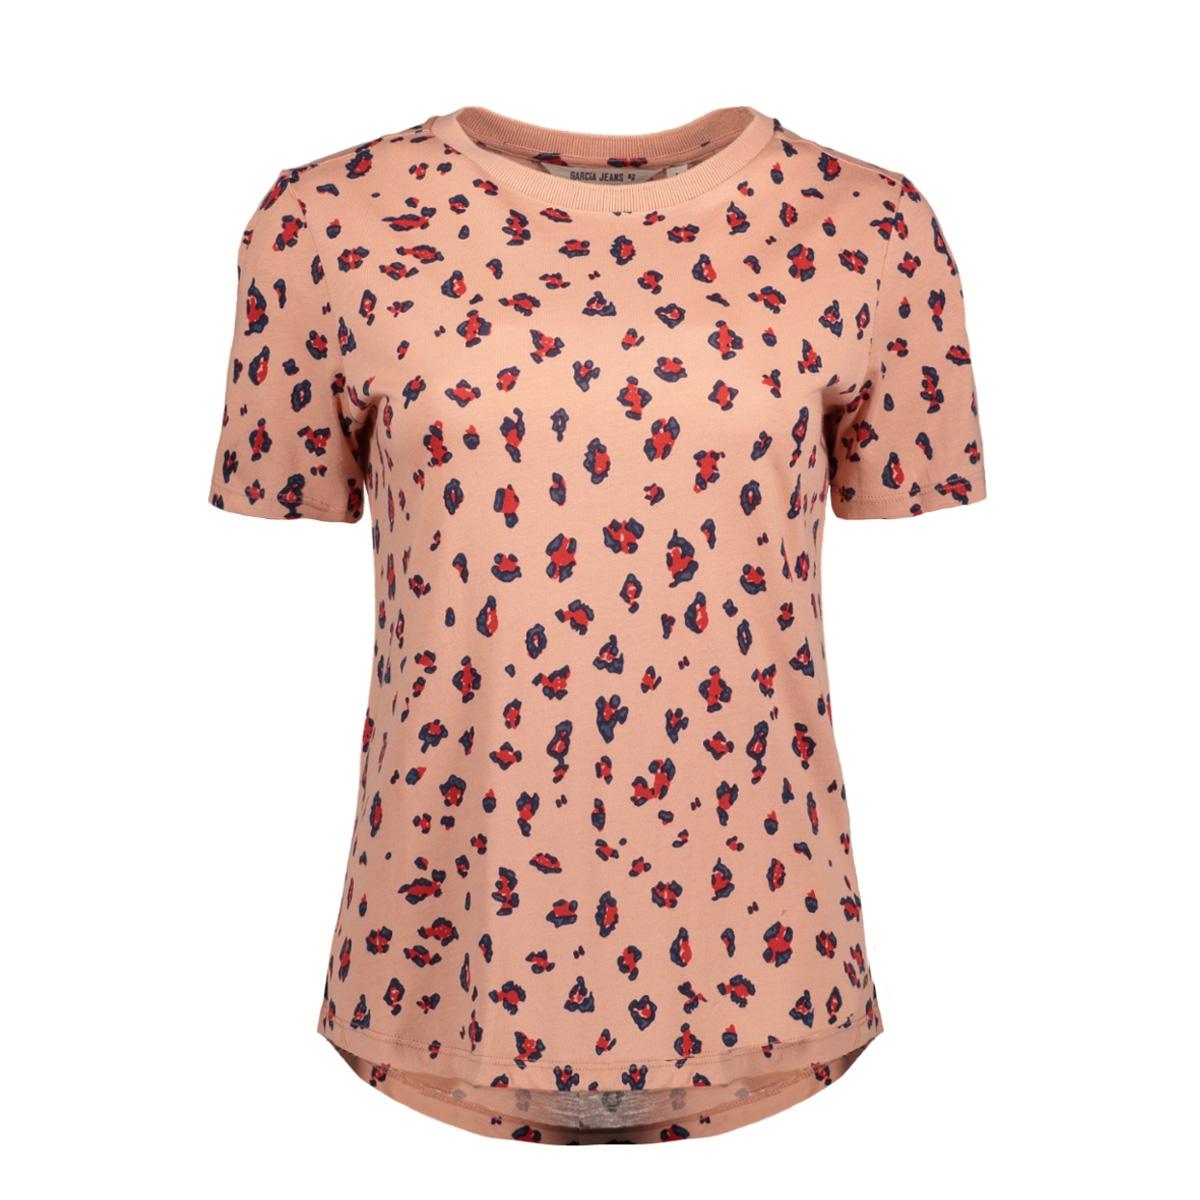 l70204 garcia t-shirt 2549 salmon pink